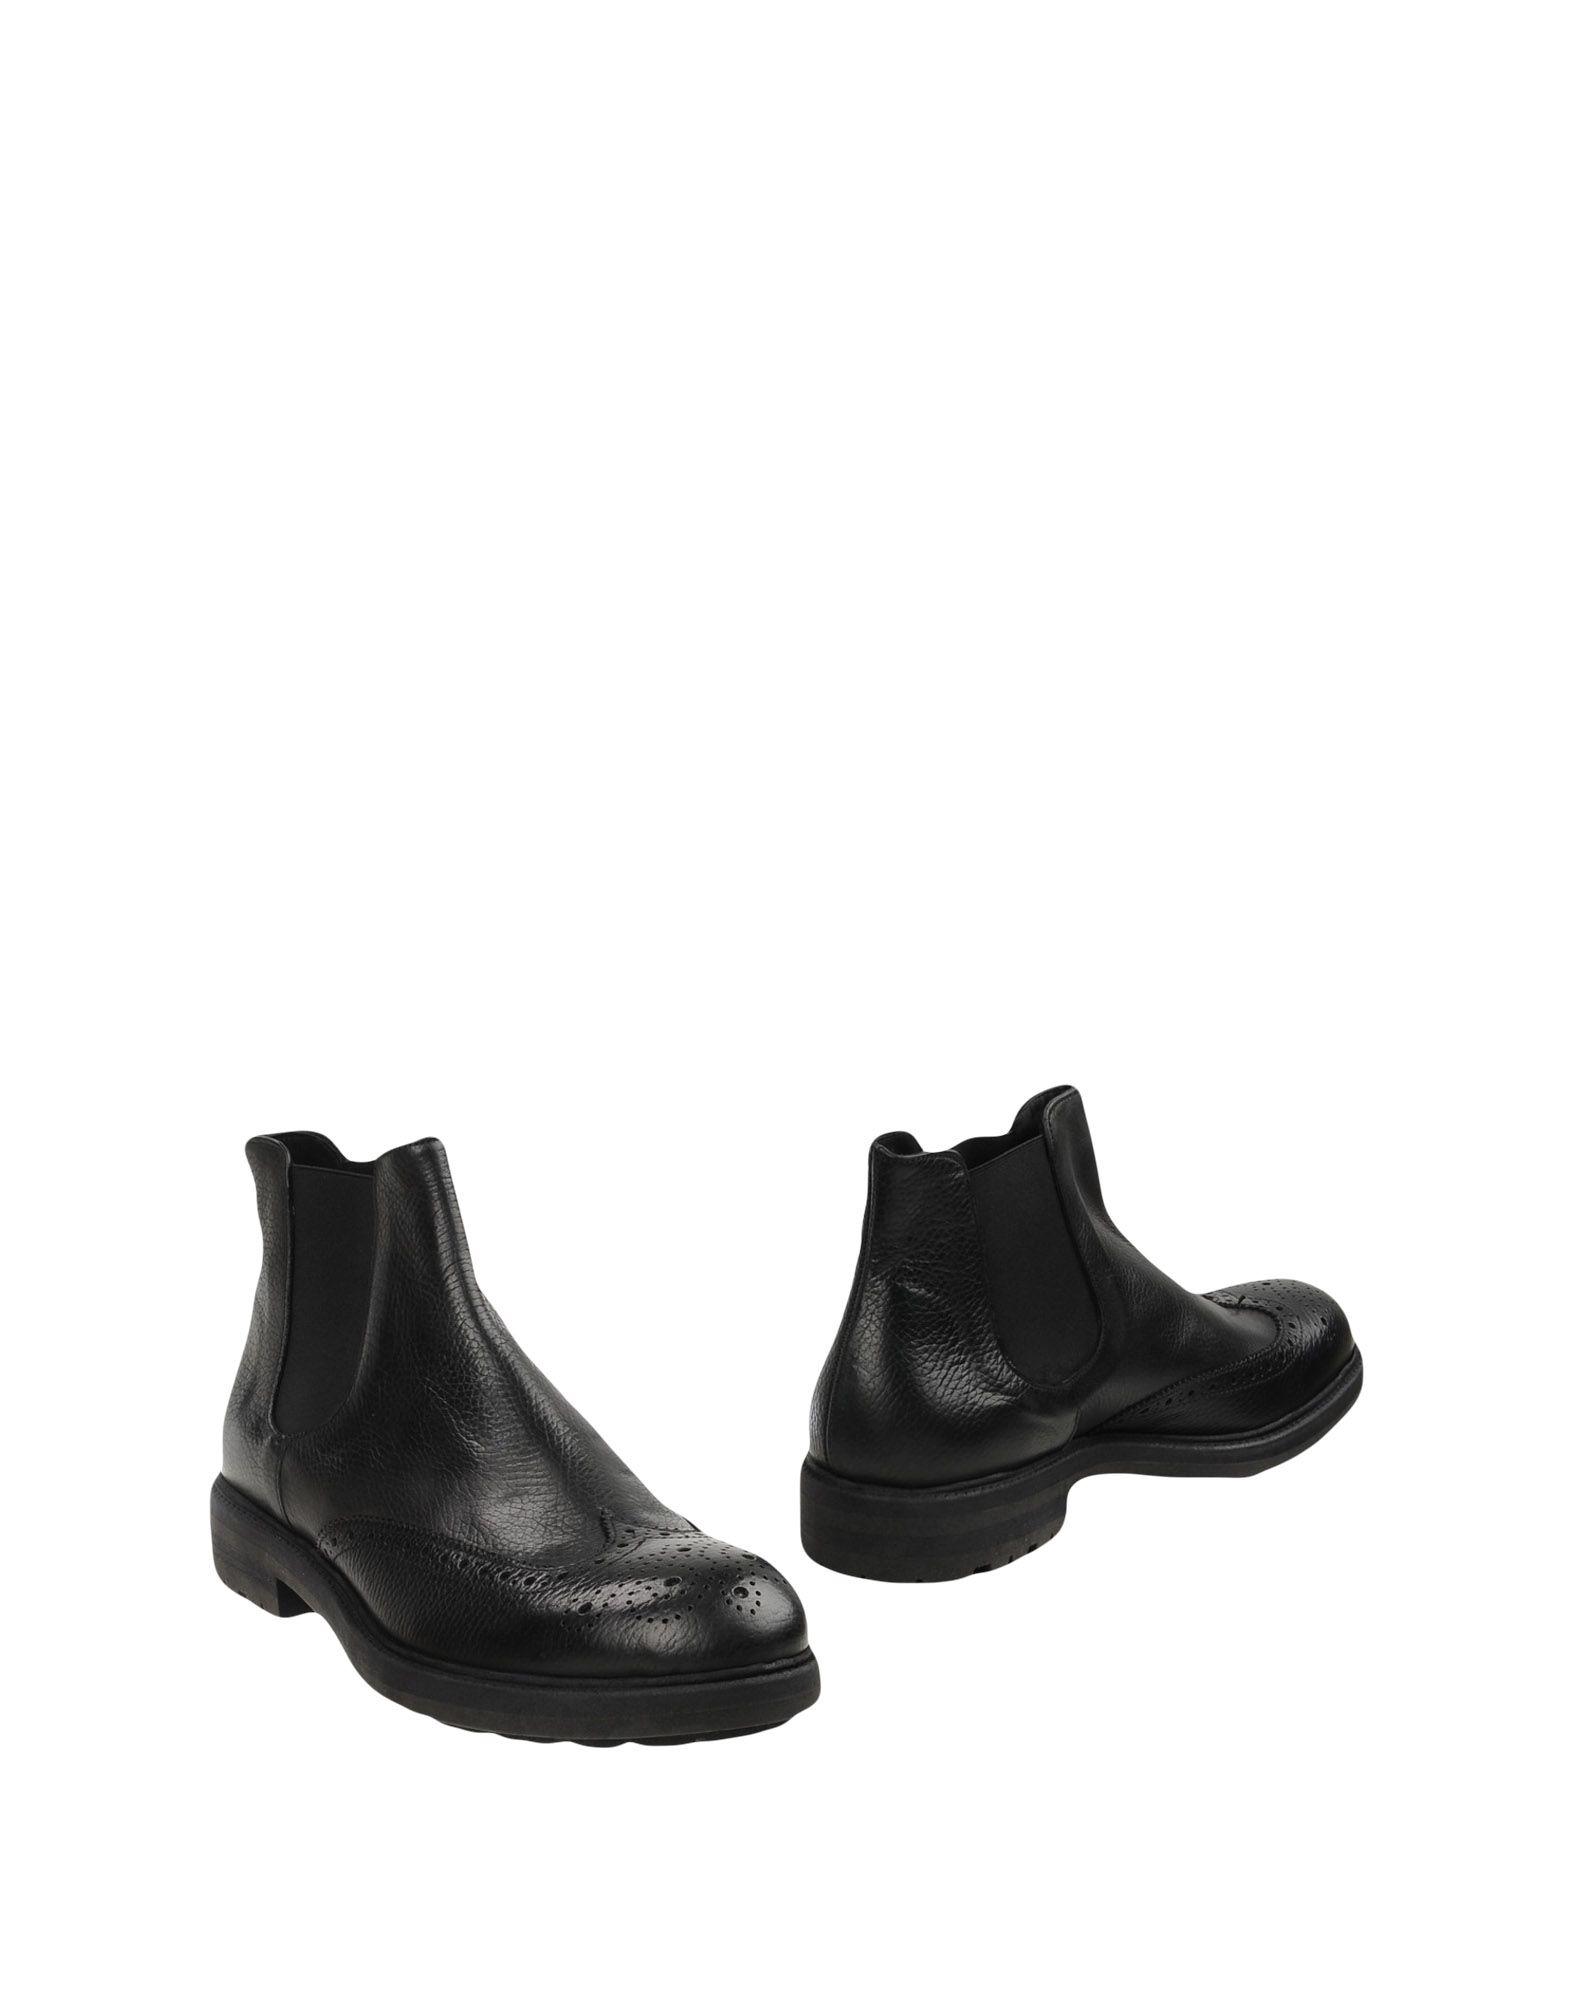 8 Полусапоги и высокие ботинки magazzini del sale полусапоги и высокие ботинки